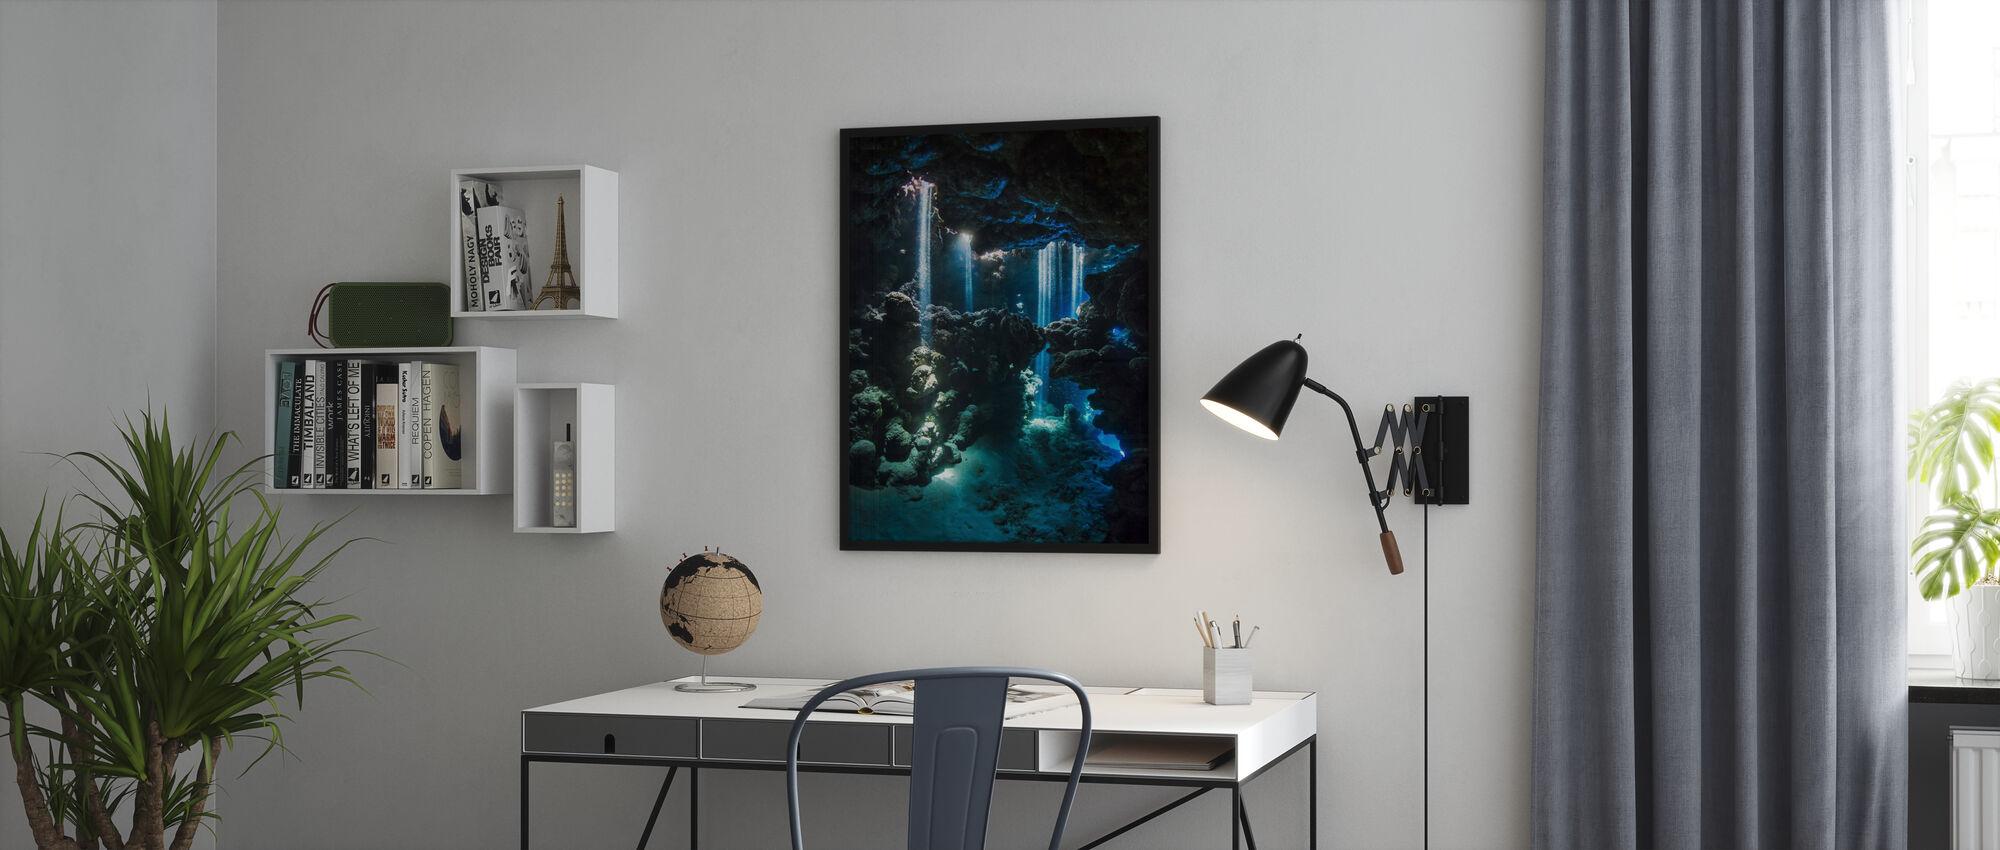 Shafts of Light - Framed print - Office